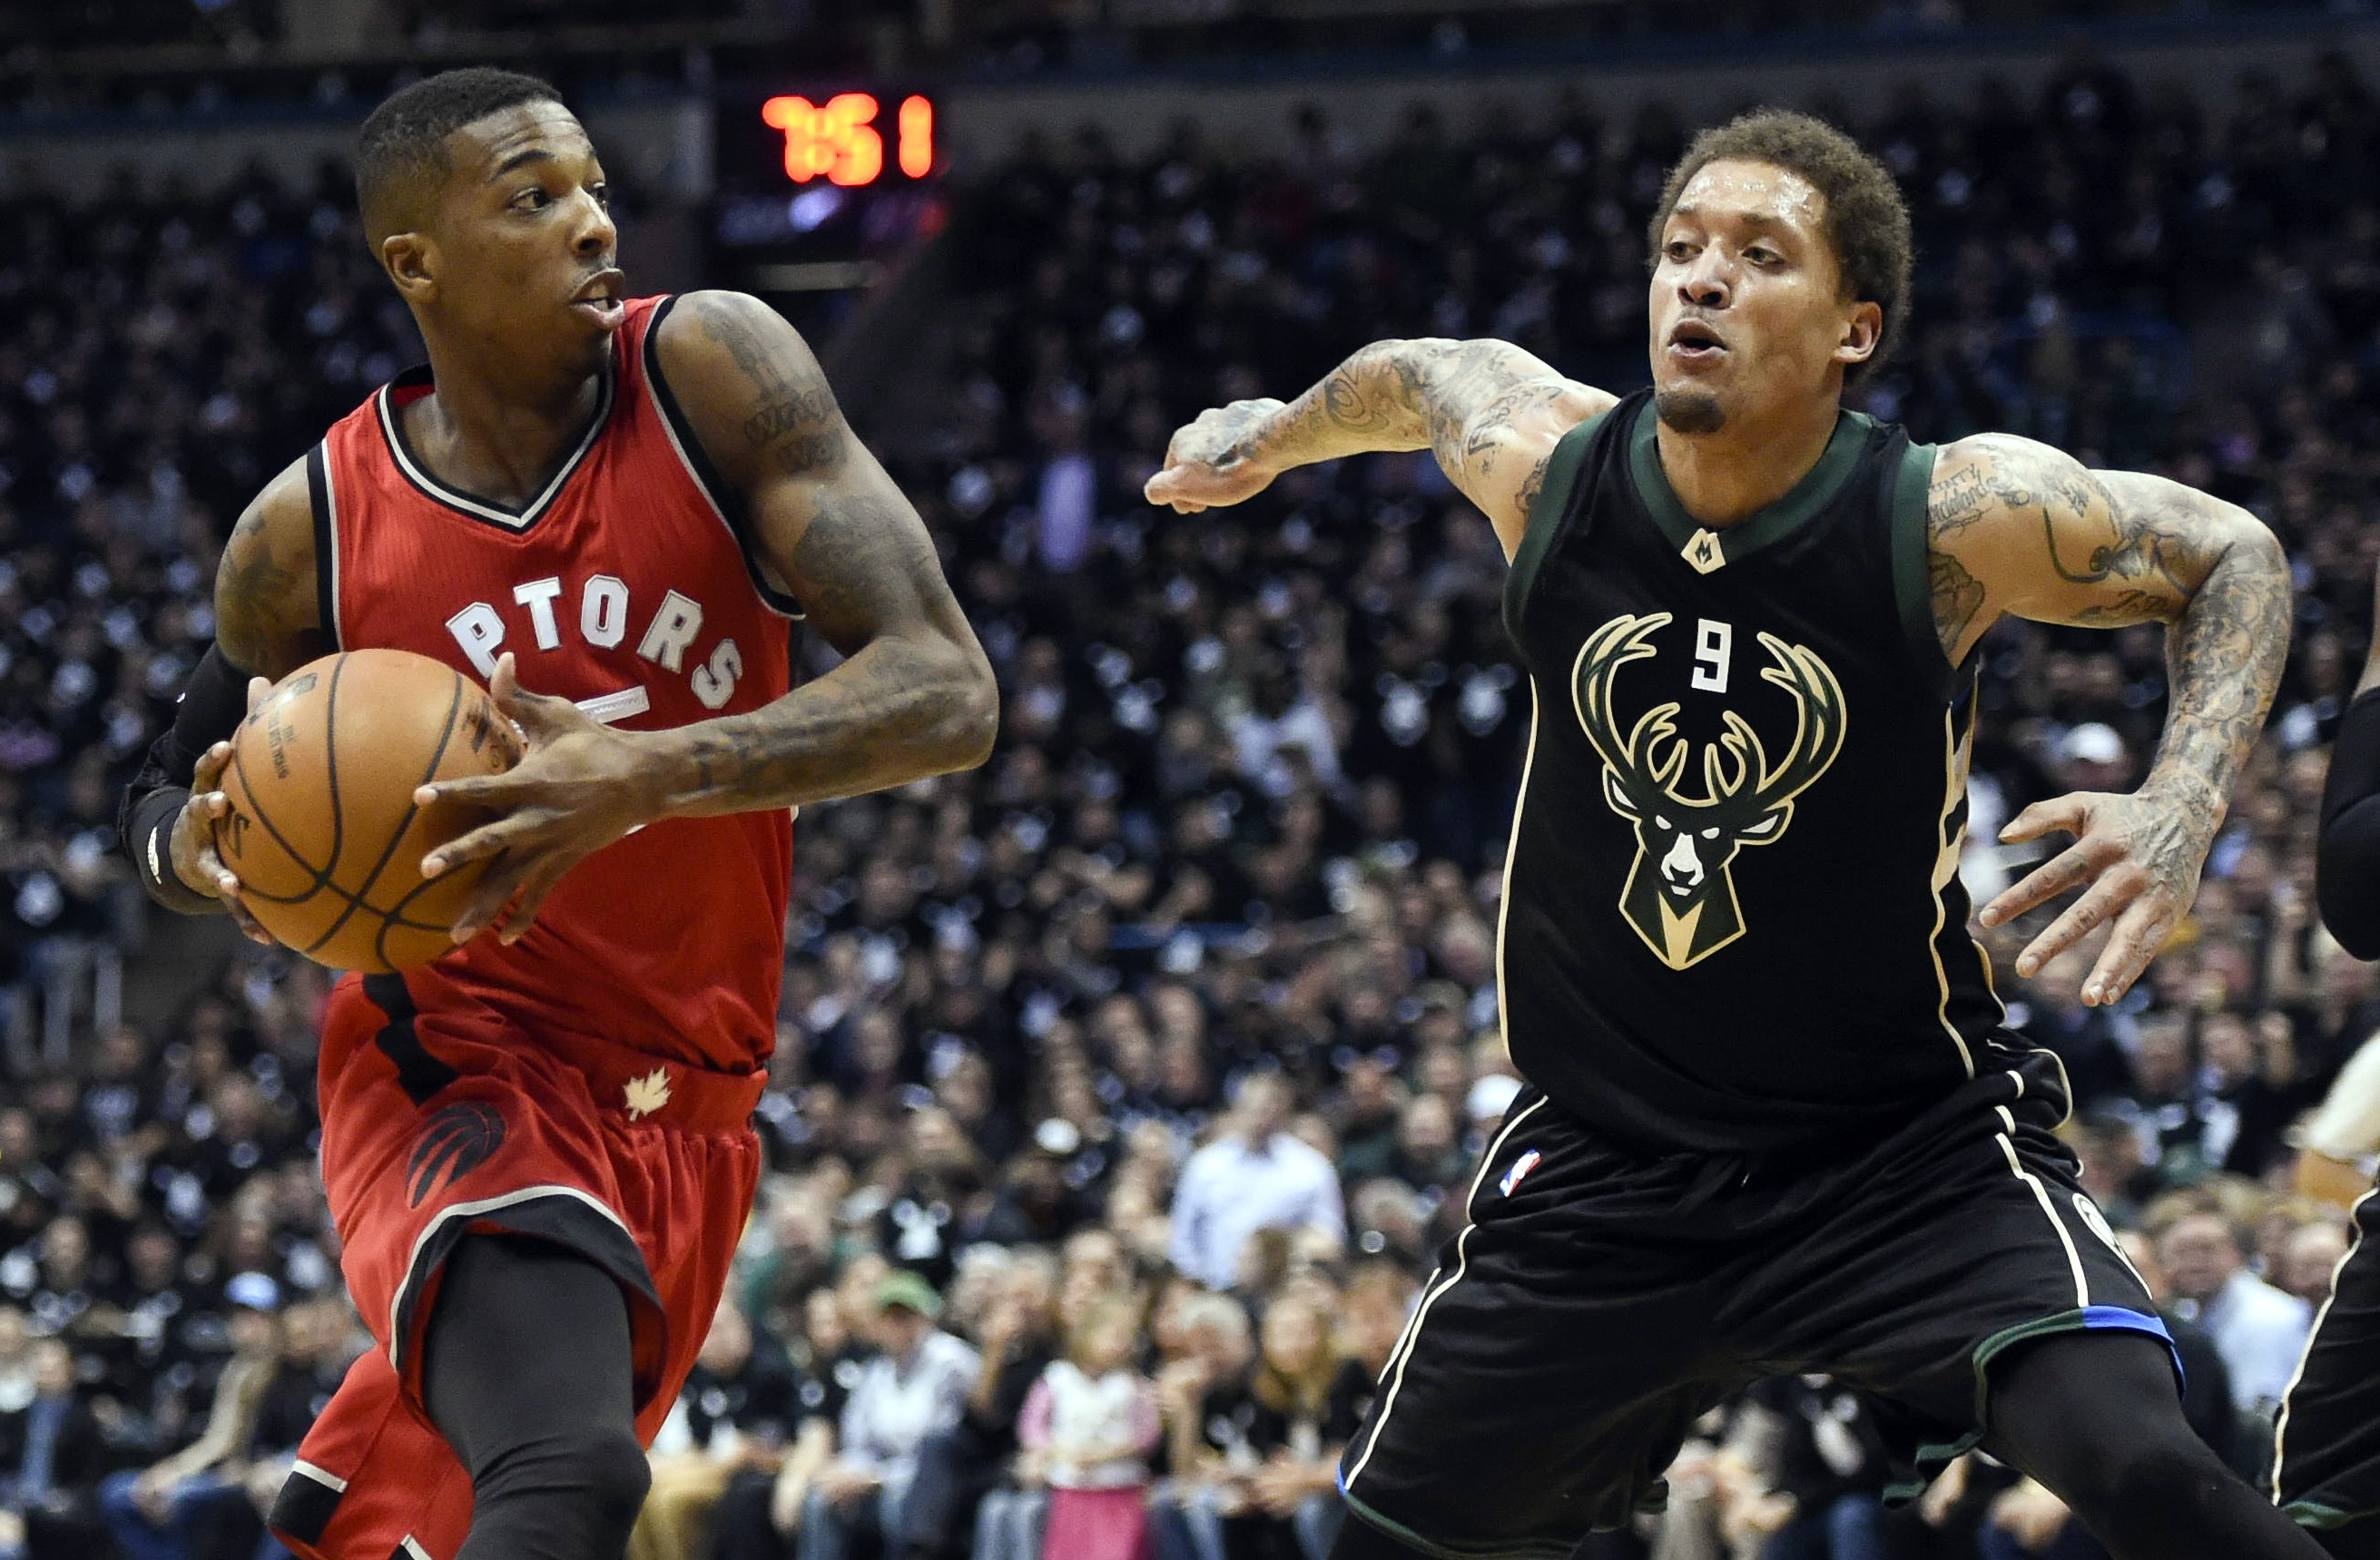 Toronto Raptors: Toronto Raptors 2016-17 Player Grades: The Youngsters